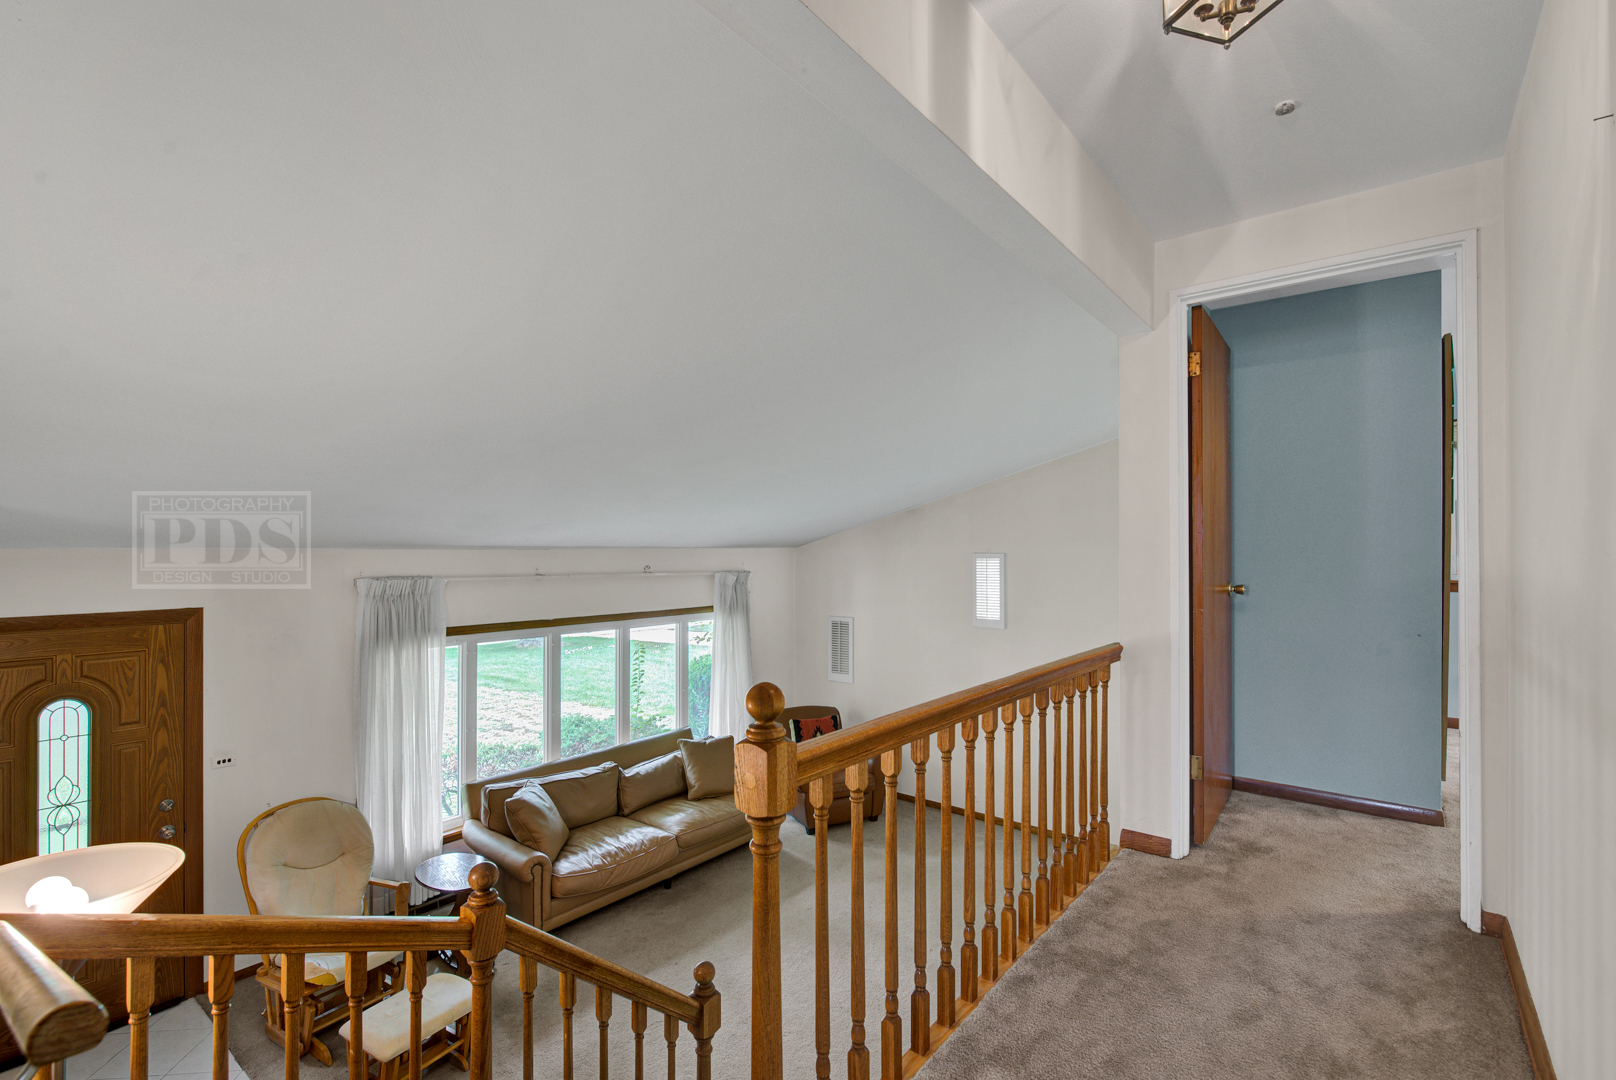 12637 South Major, Palos Heights, Illinois, 60463